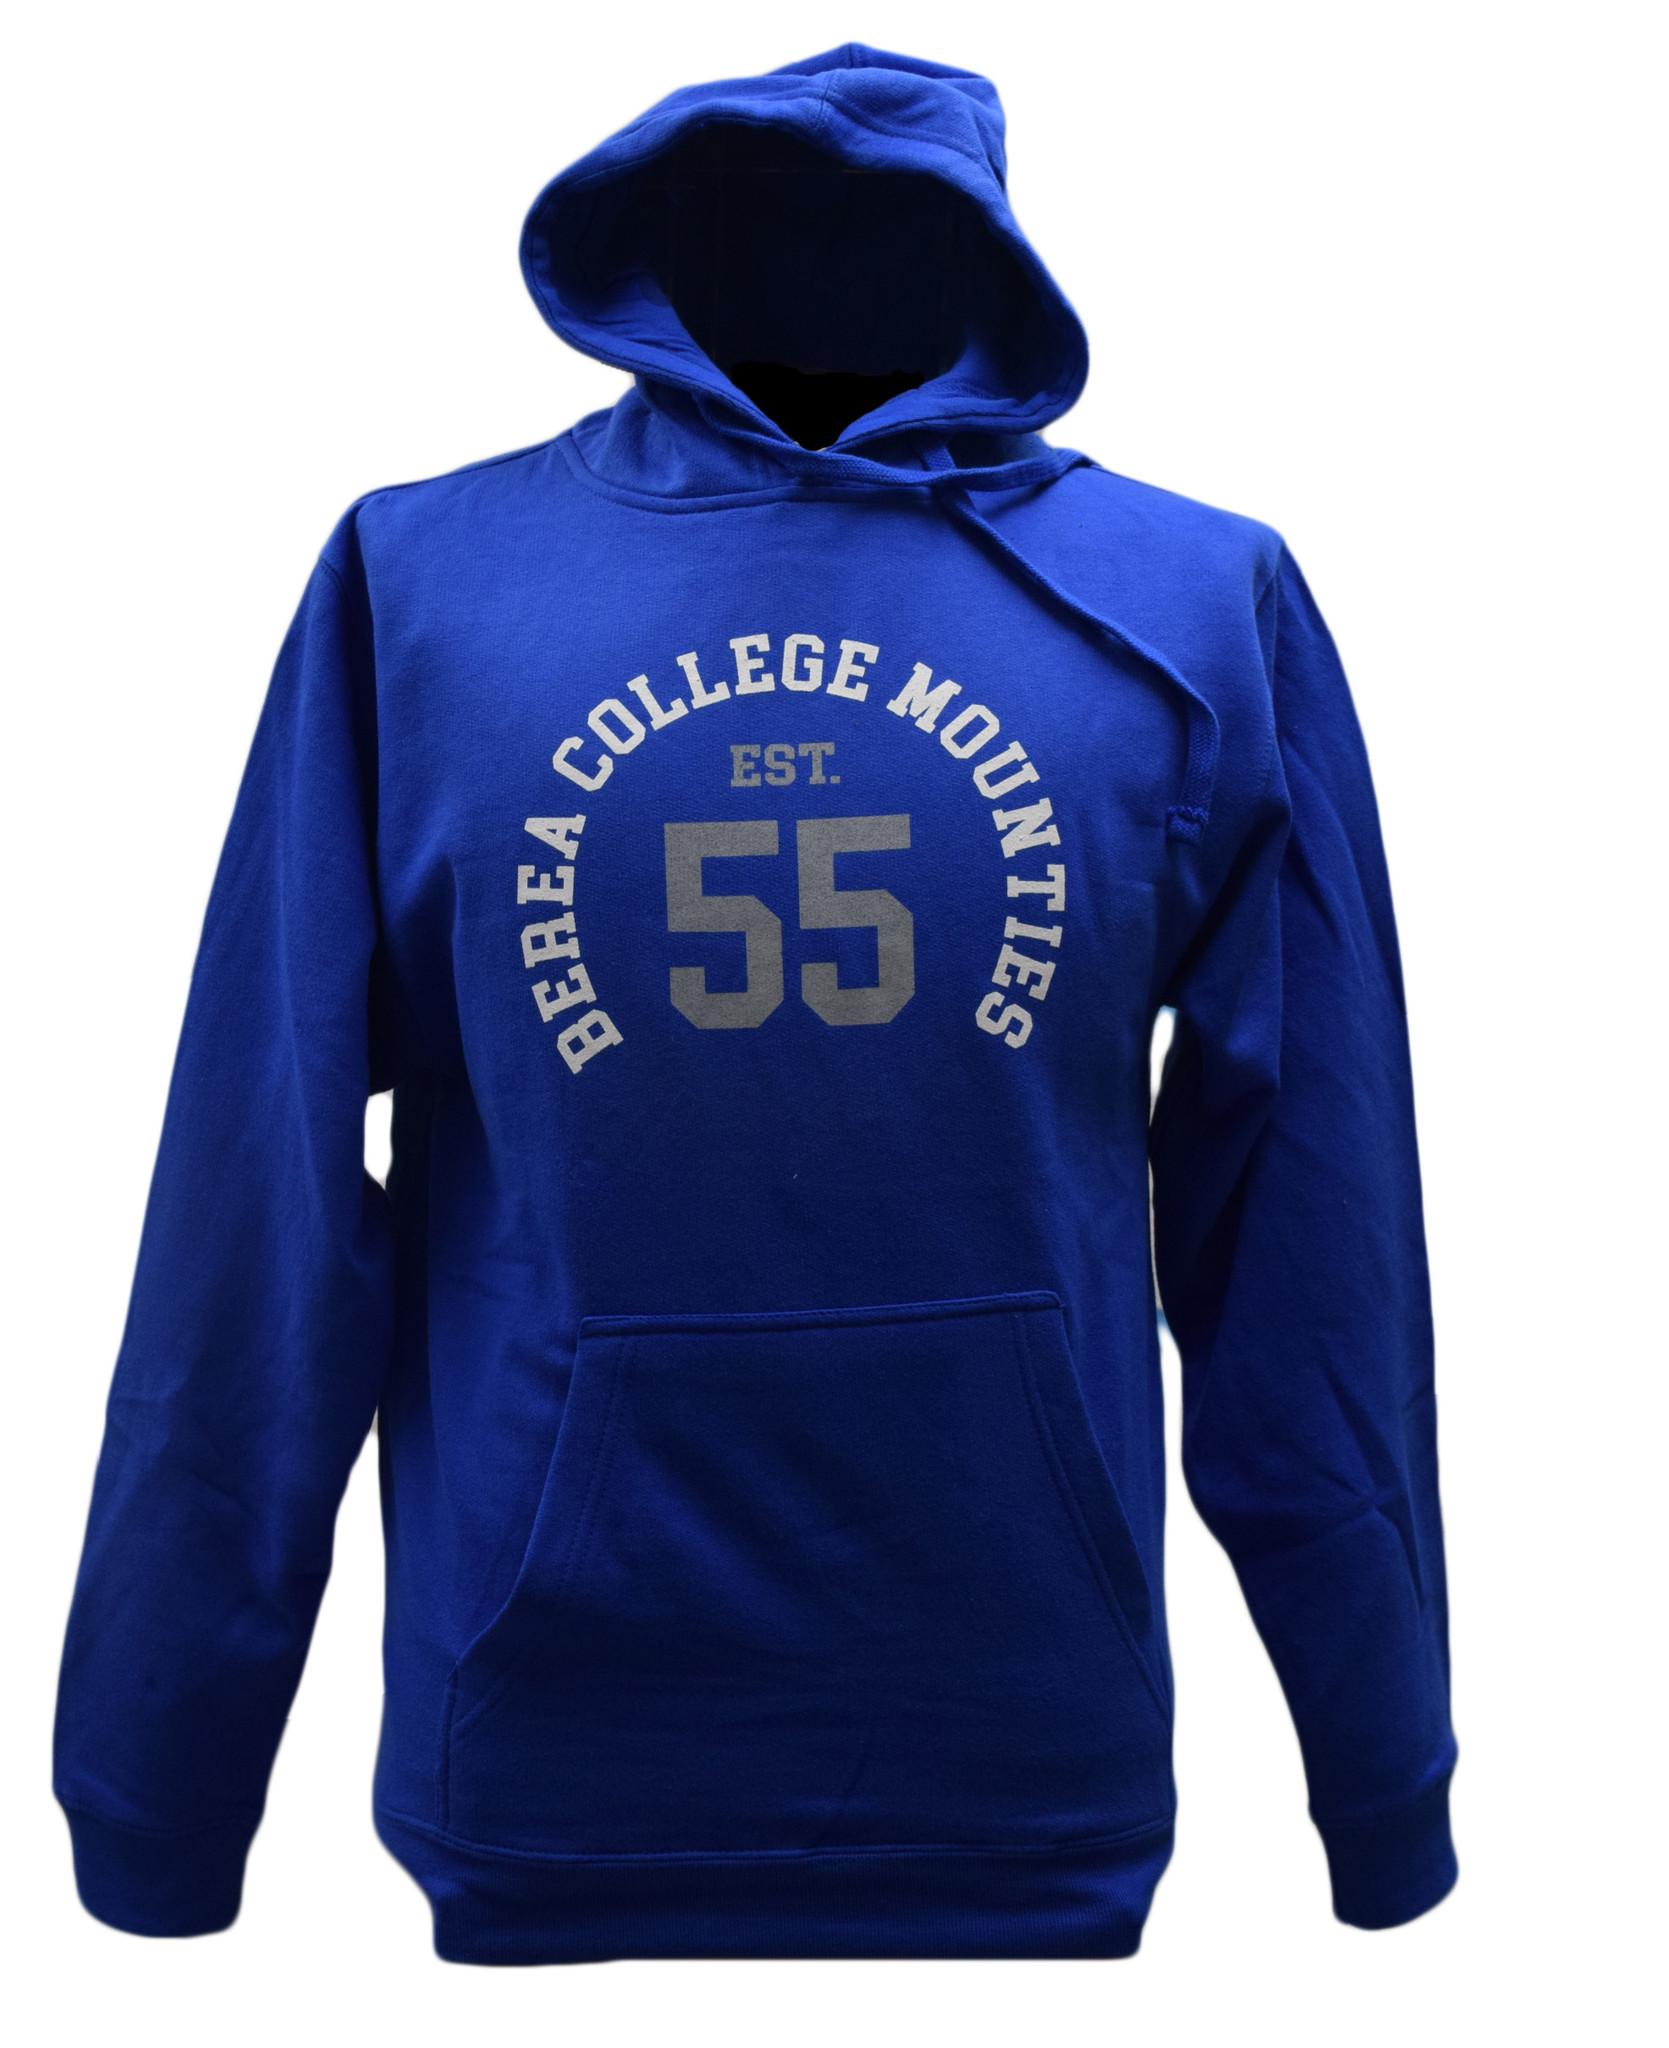 Hoodie & T-shirt  Combo-1